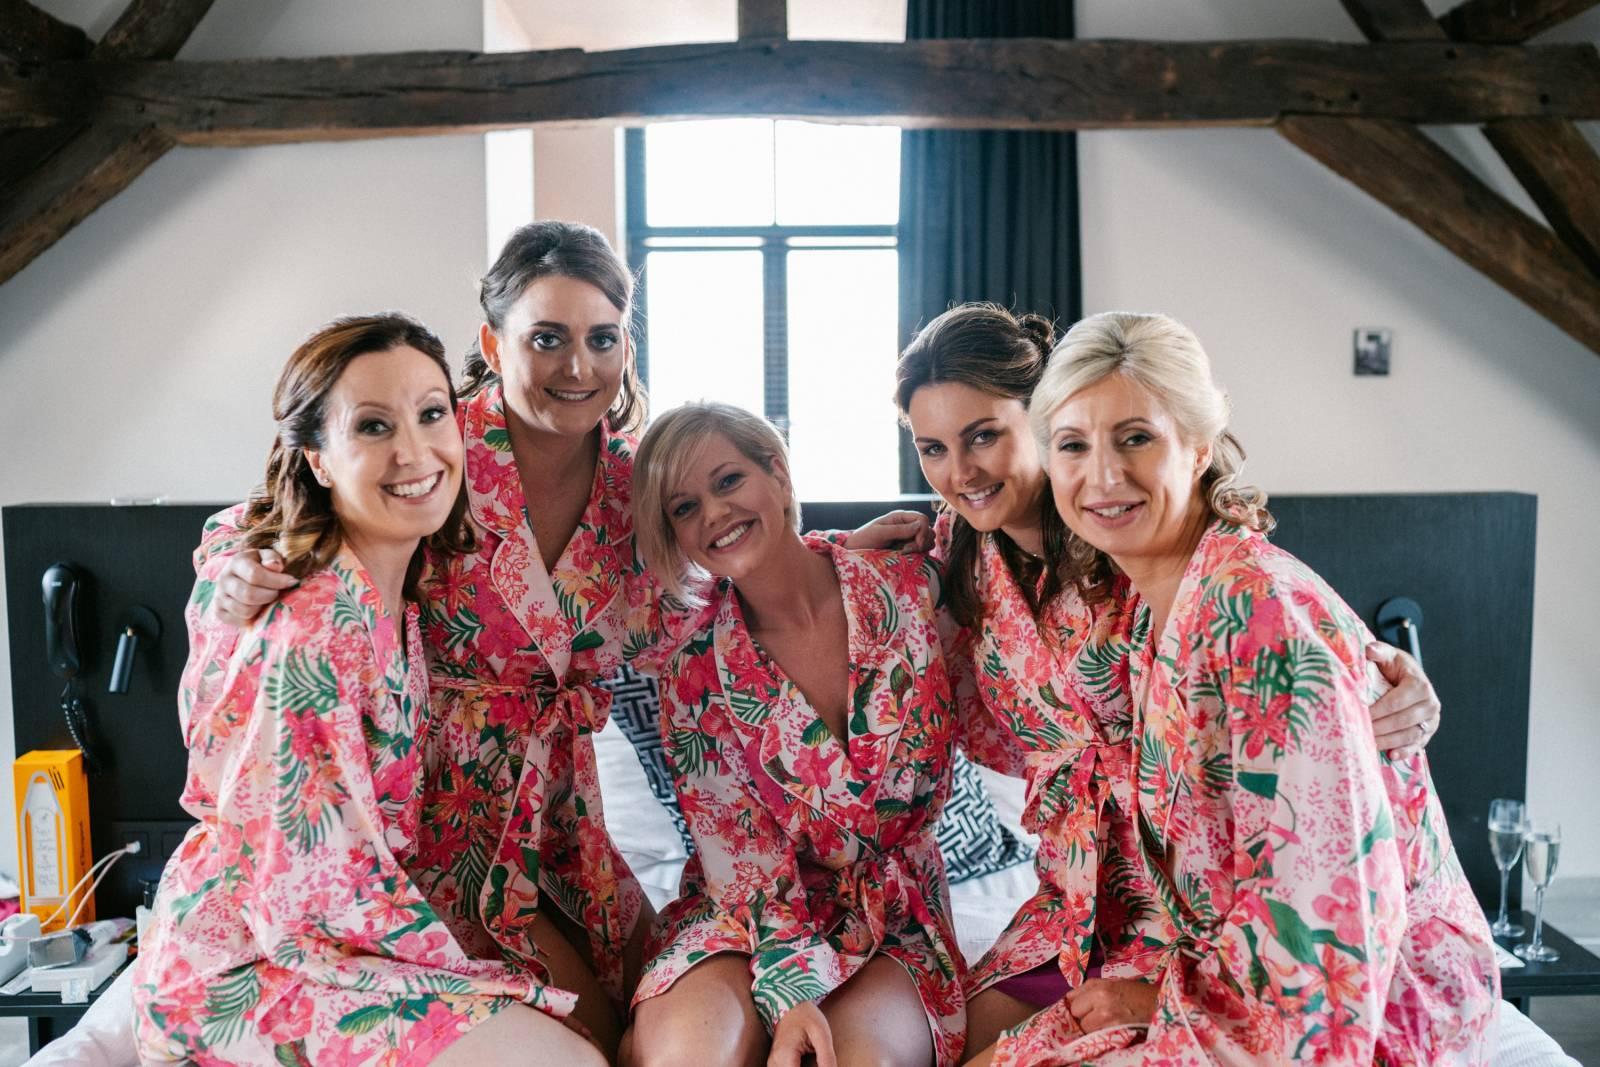 Elegant Events - Weddingplanner - Fotograaf Tom Leuntjens Photography - House of Weddings (3)